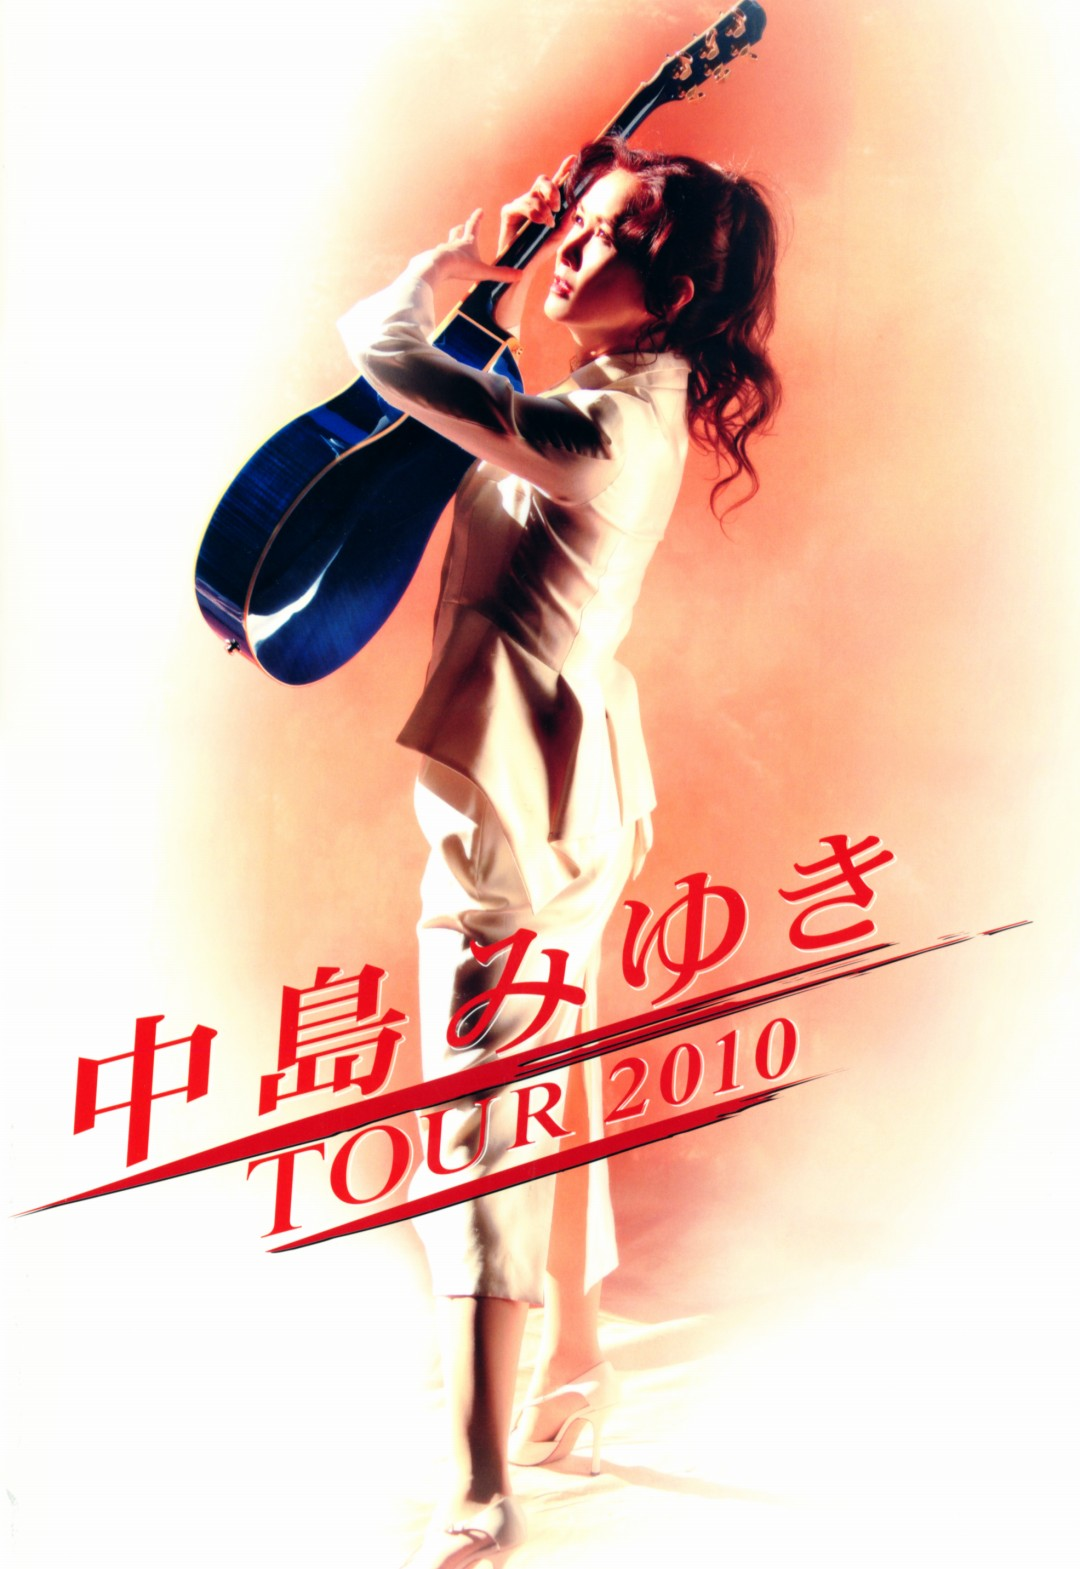 [Live] 2010-2011 TOUR 2010